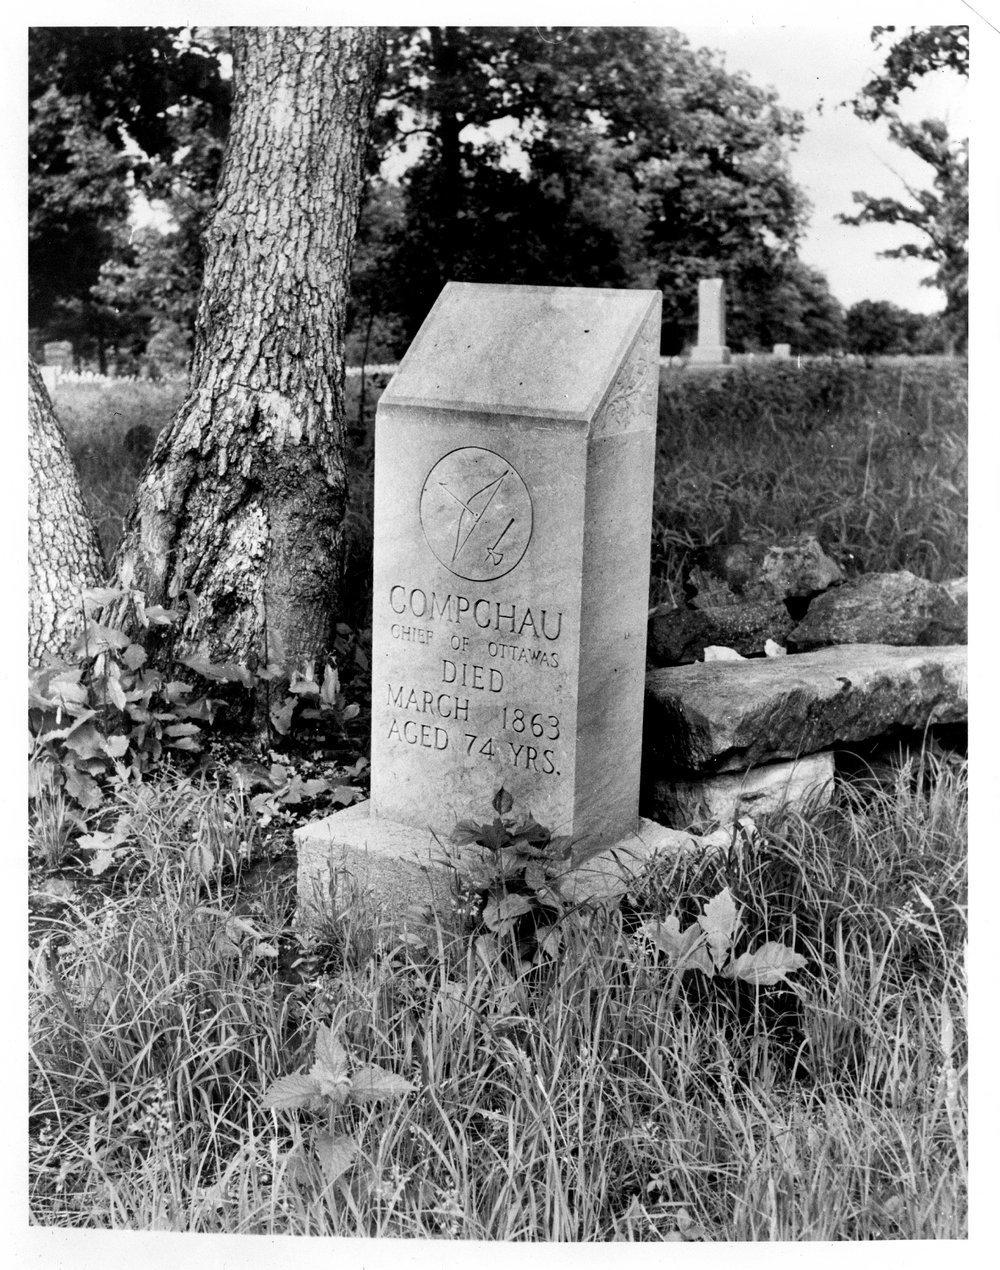 Gravestone of Chief Compchau